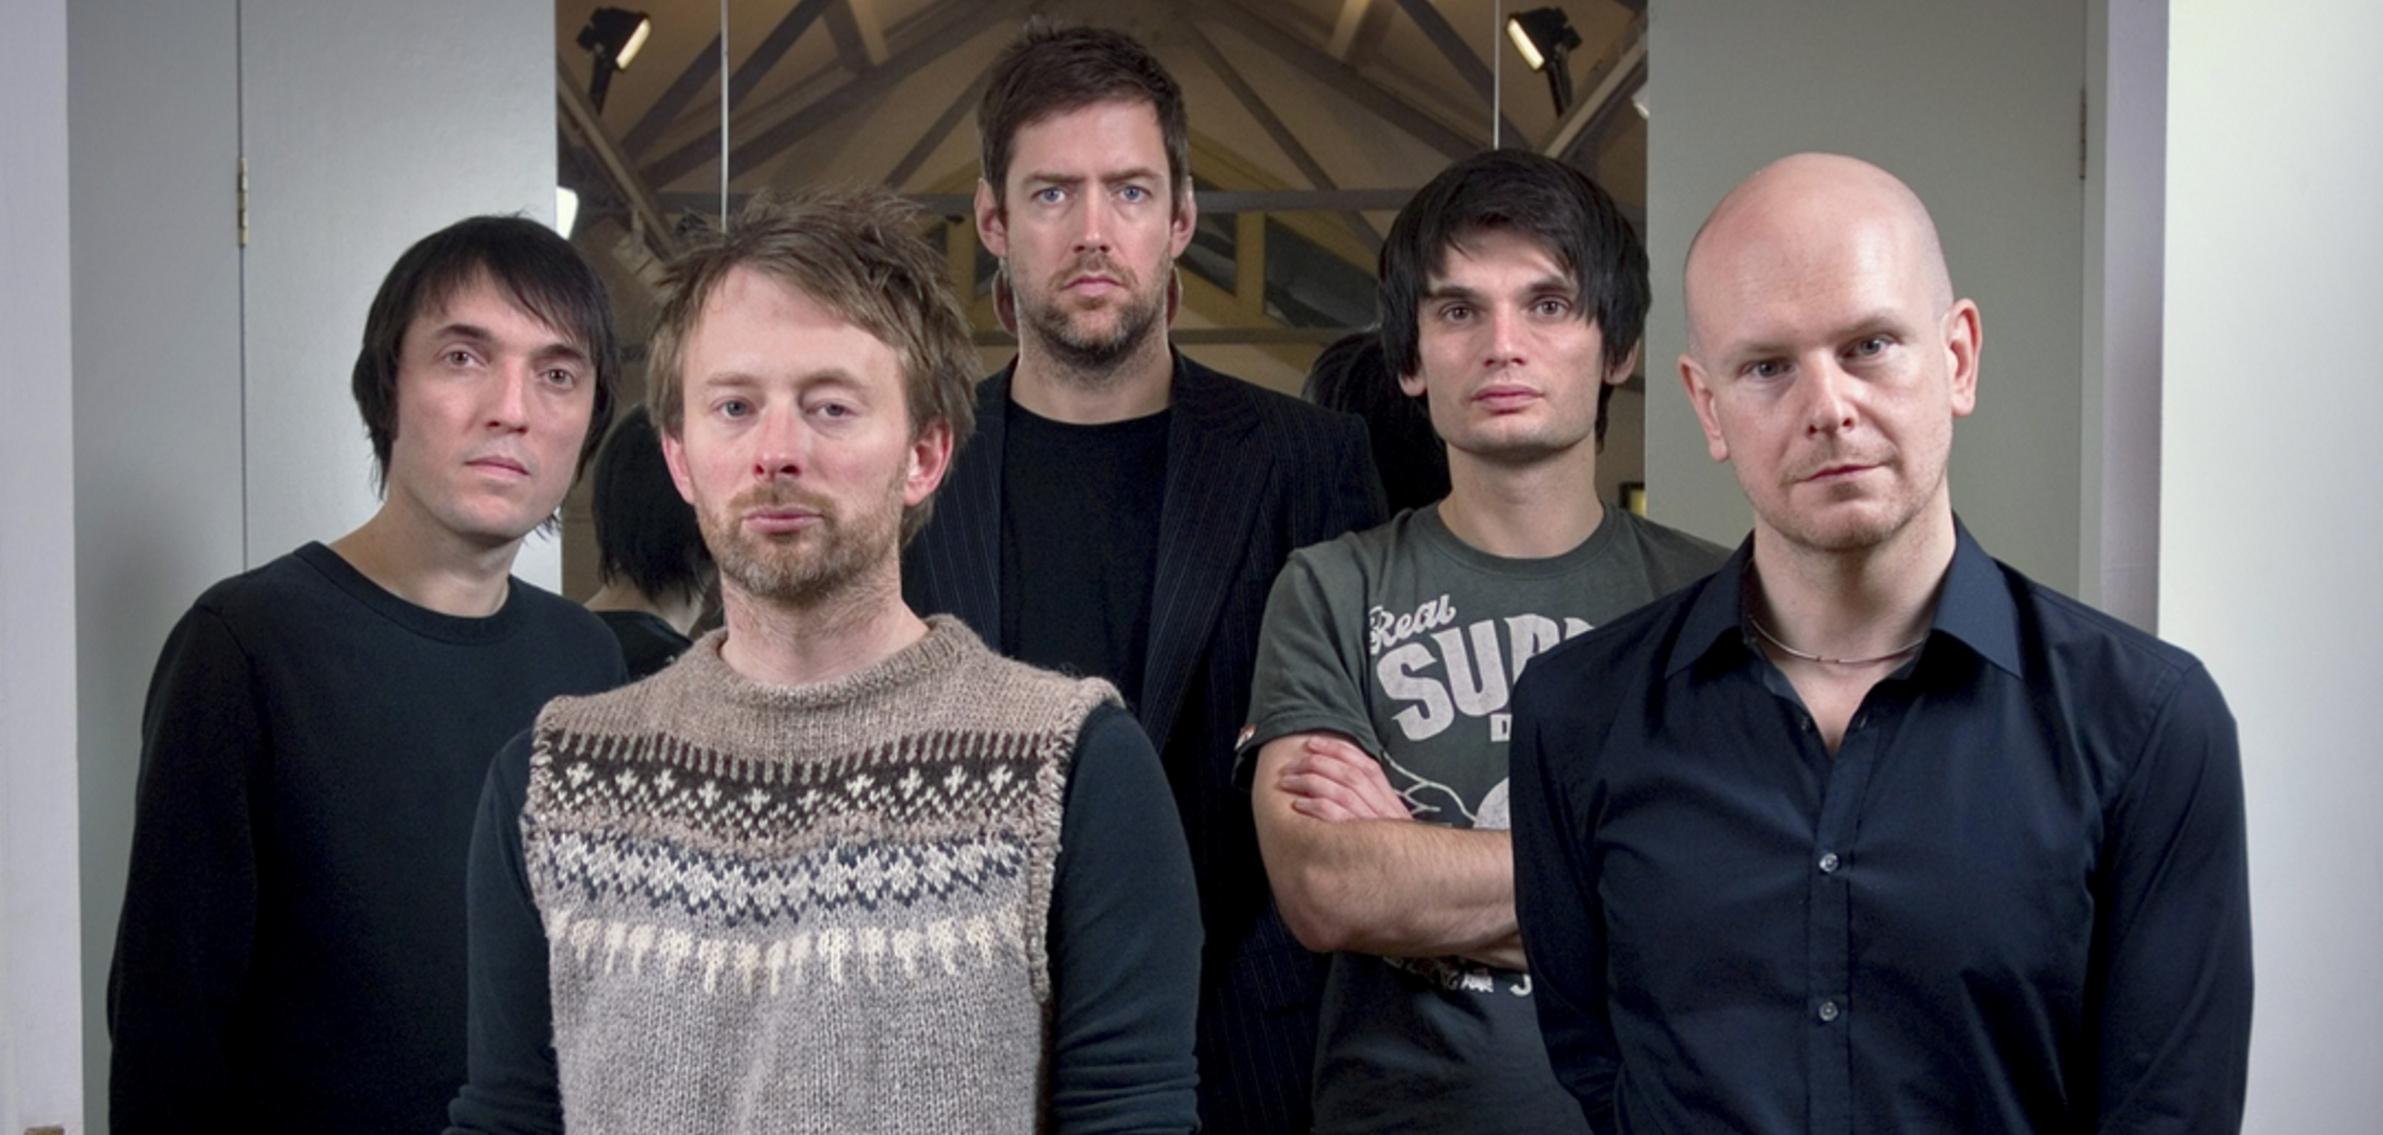 I Radiohead scompaiono dal web: i loro profili tutti in bianco